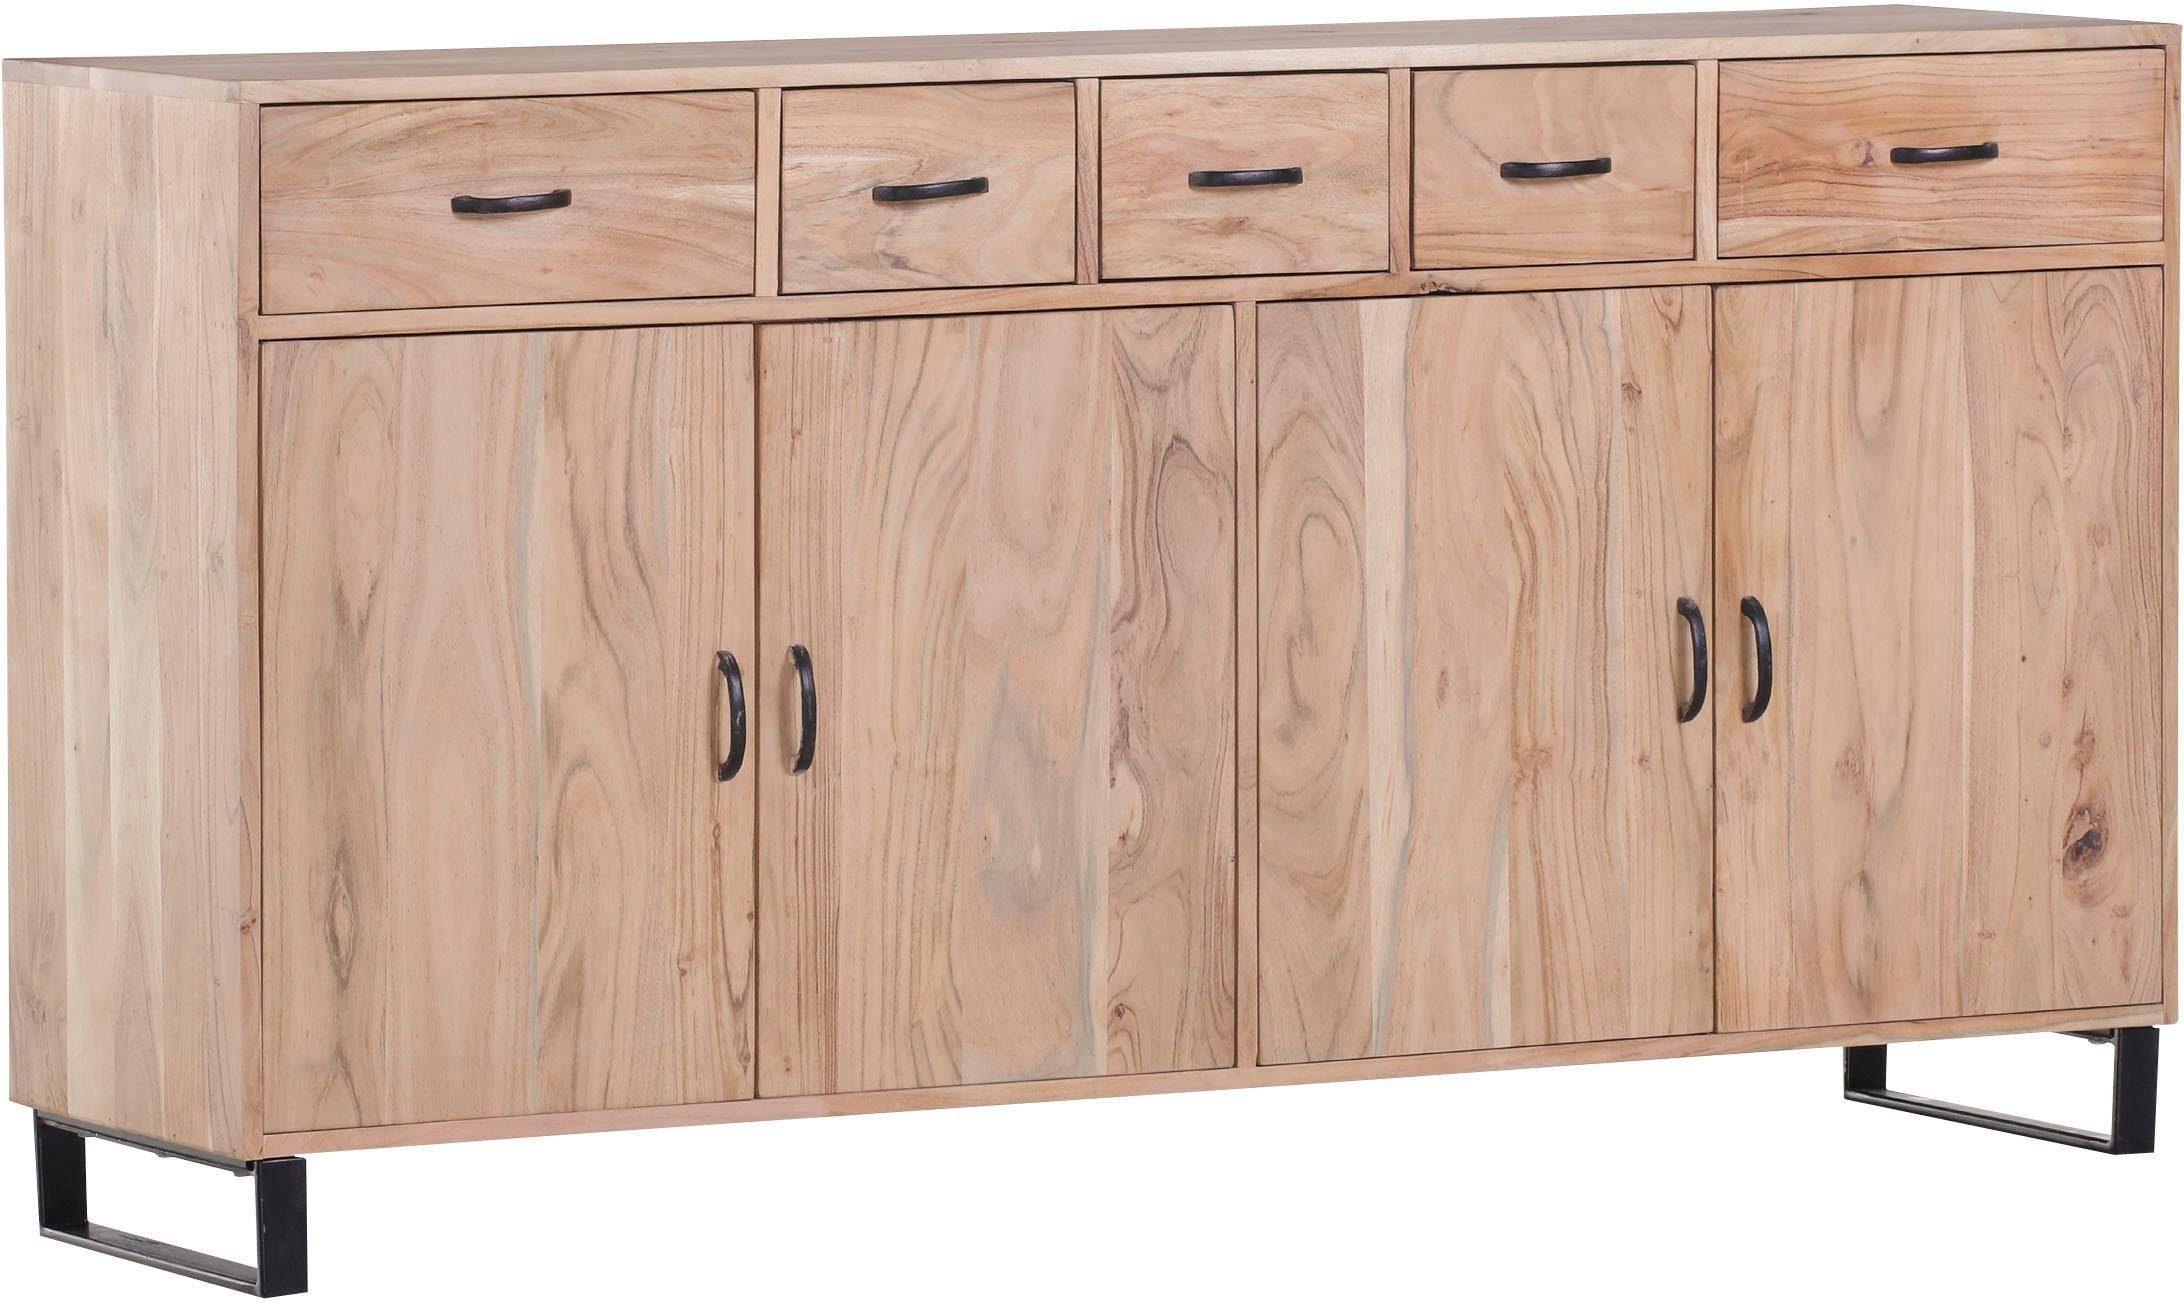 Gutmann Factory Sideboard »Georgia« aus massivem Akazienholz, Breite 165 cm